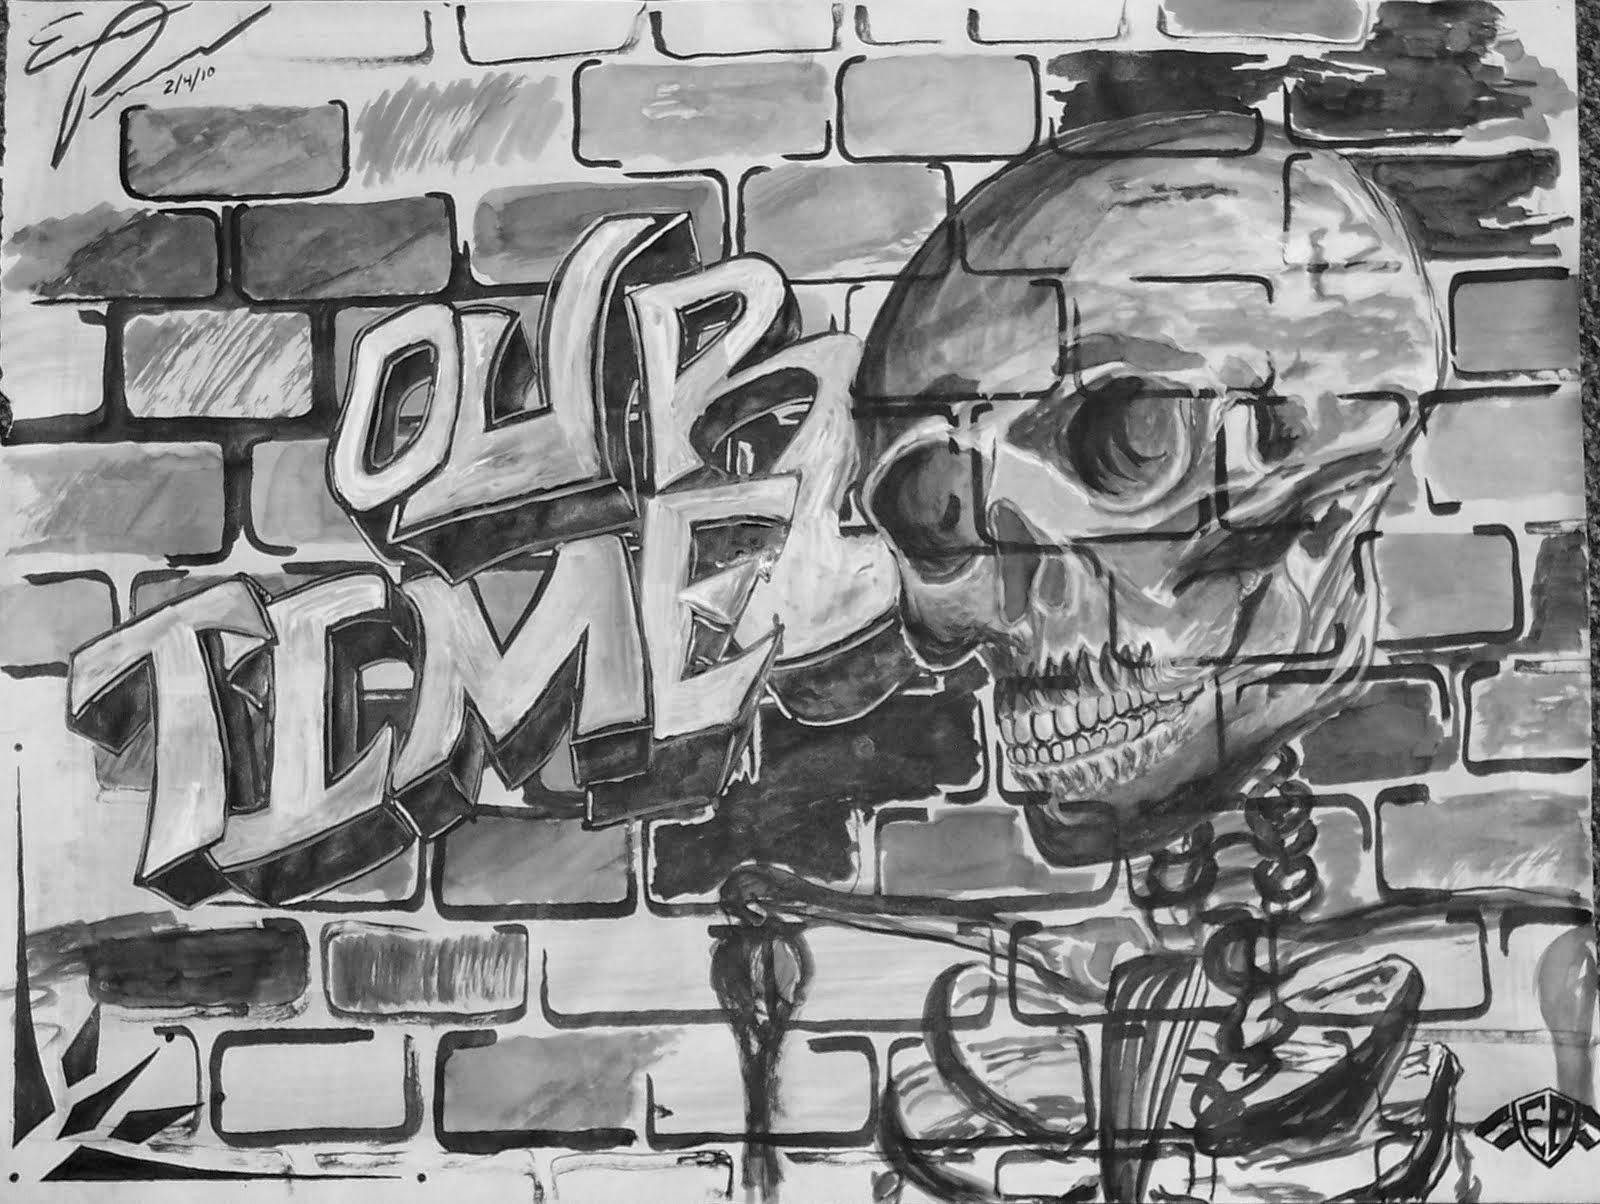 Graffiti wall black - Graffiti Brick Wall Drawing